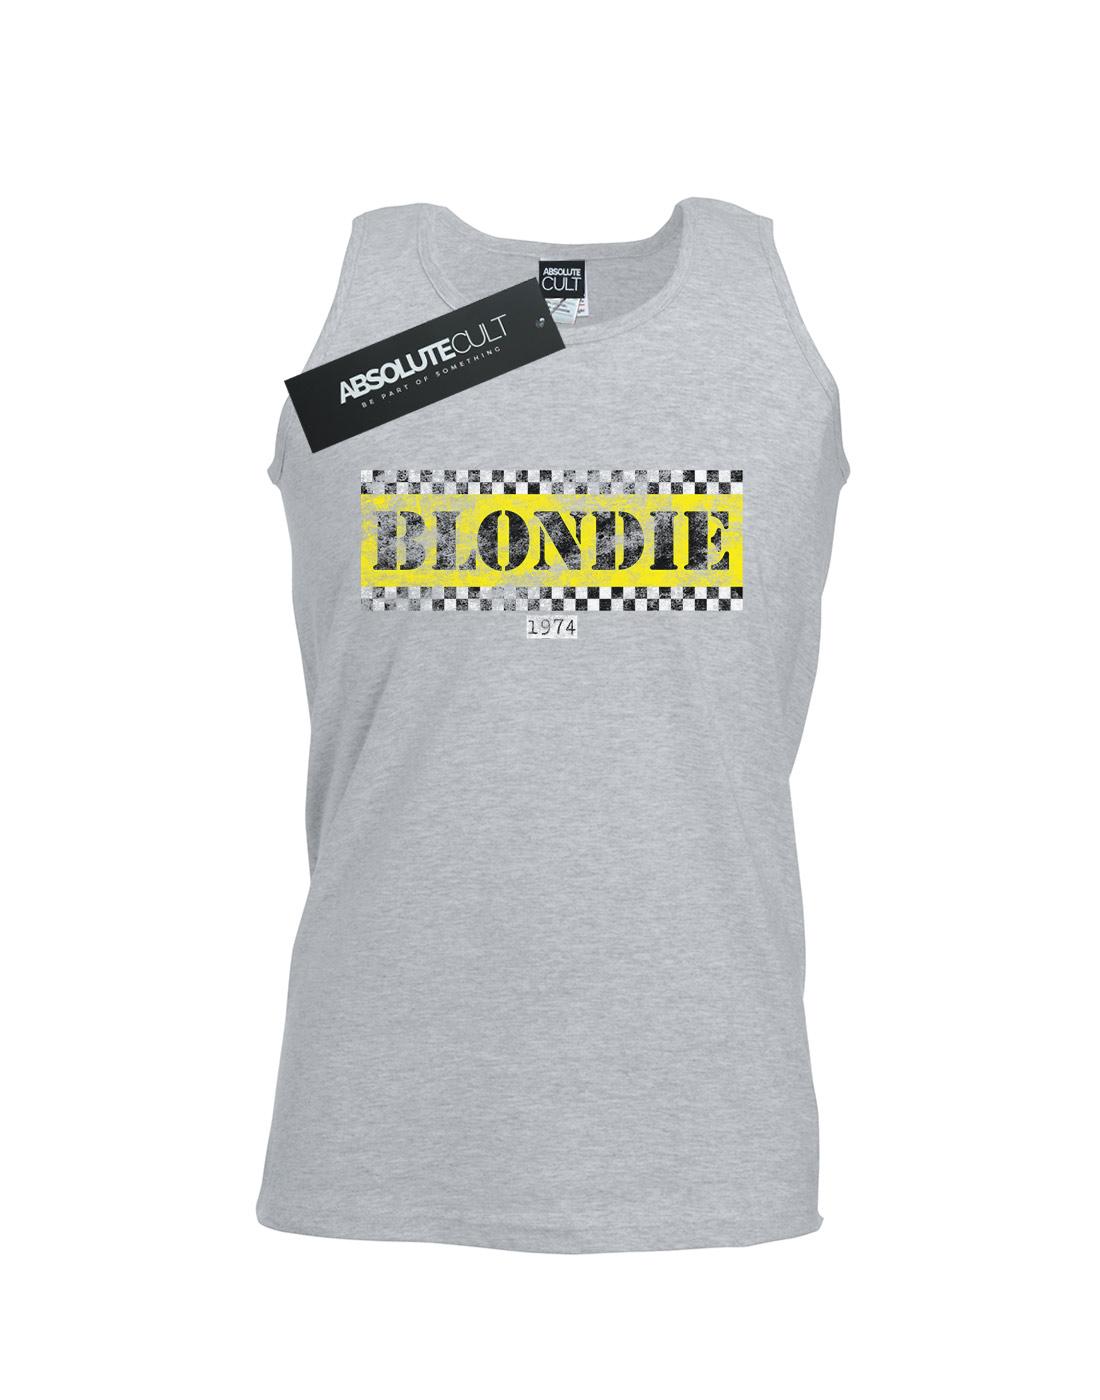 Blondie-Hombre-Taxi-74-Camiseta-Sin-Mangas